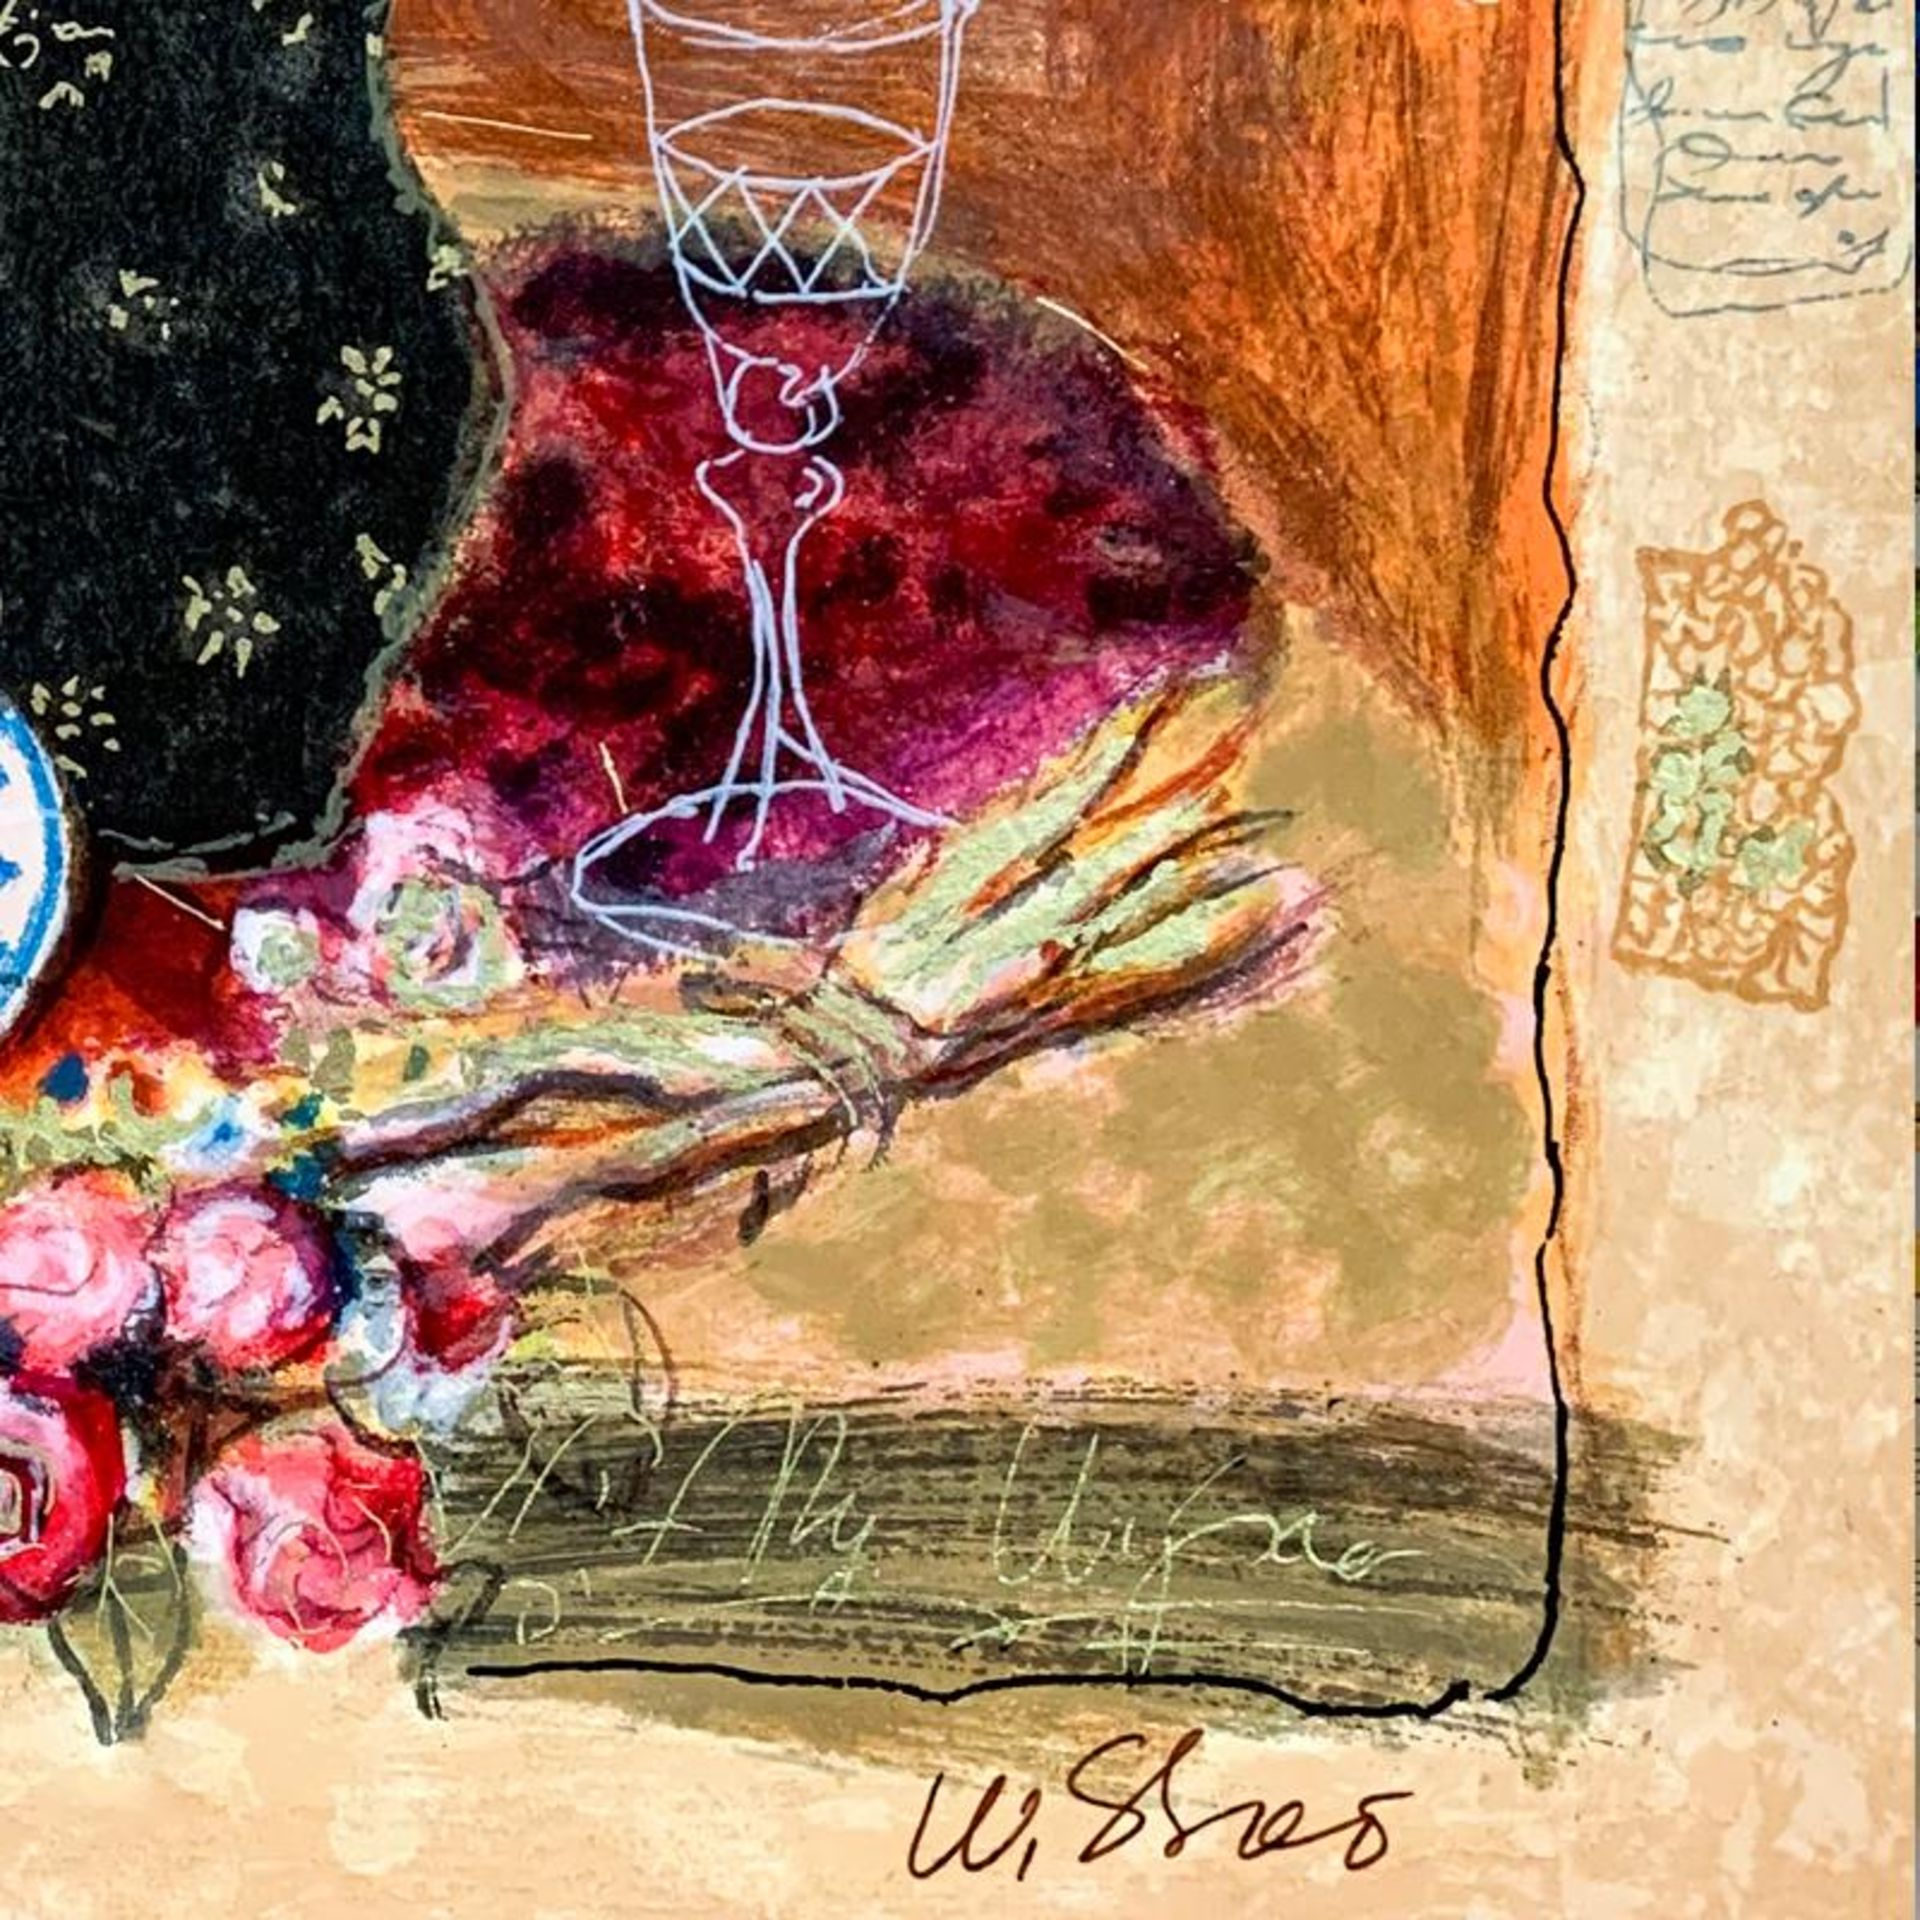 Flowers & Fruit II by Alexander & Wissotzky - Image 2 of 3